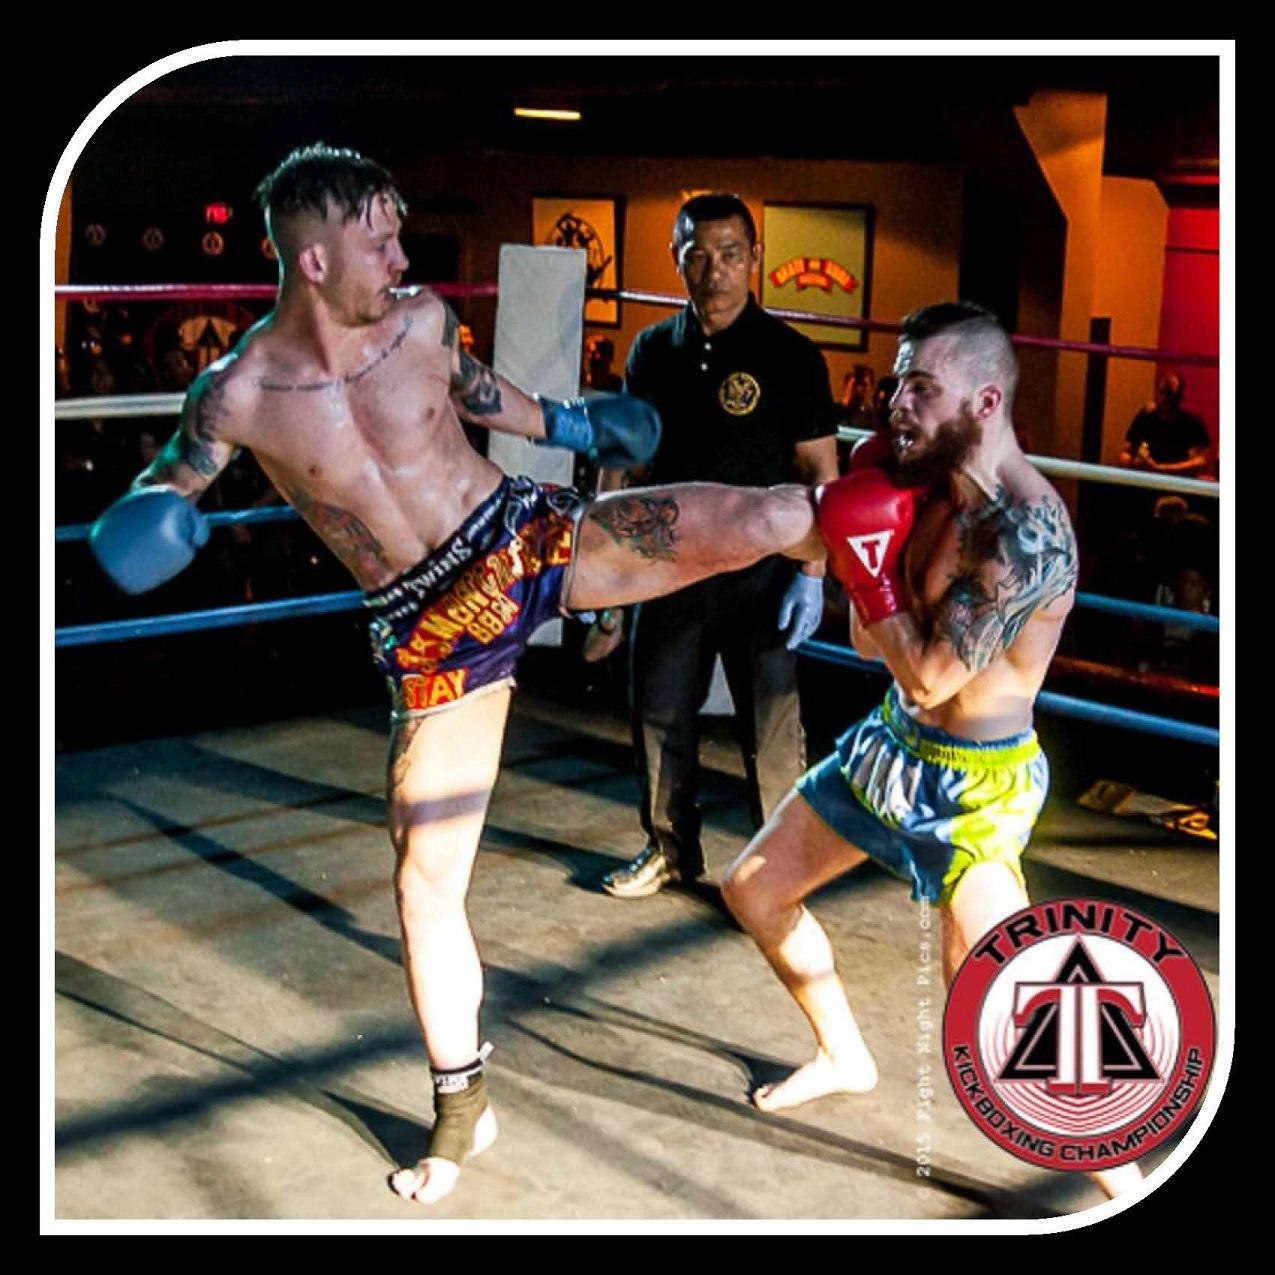 Joe Logan on the left.  Photo by Friday Night Pics (Chastity Cortijo) for Muay Thaimes®.